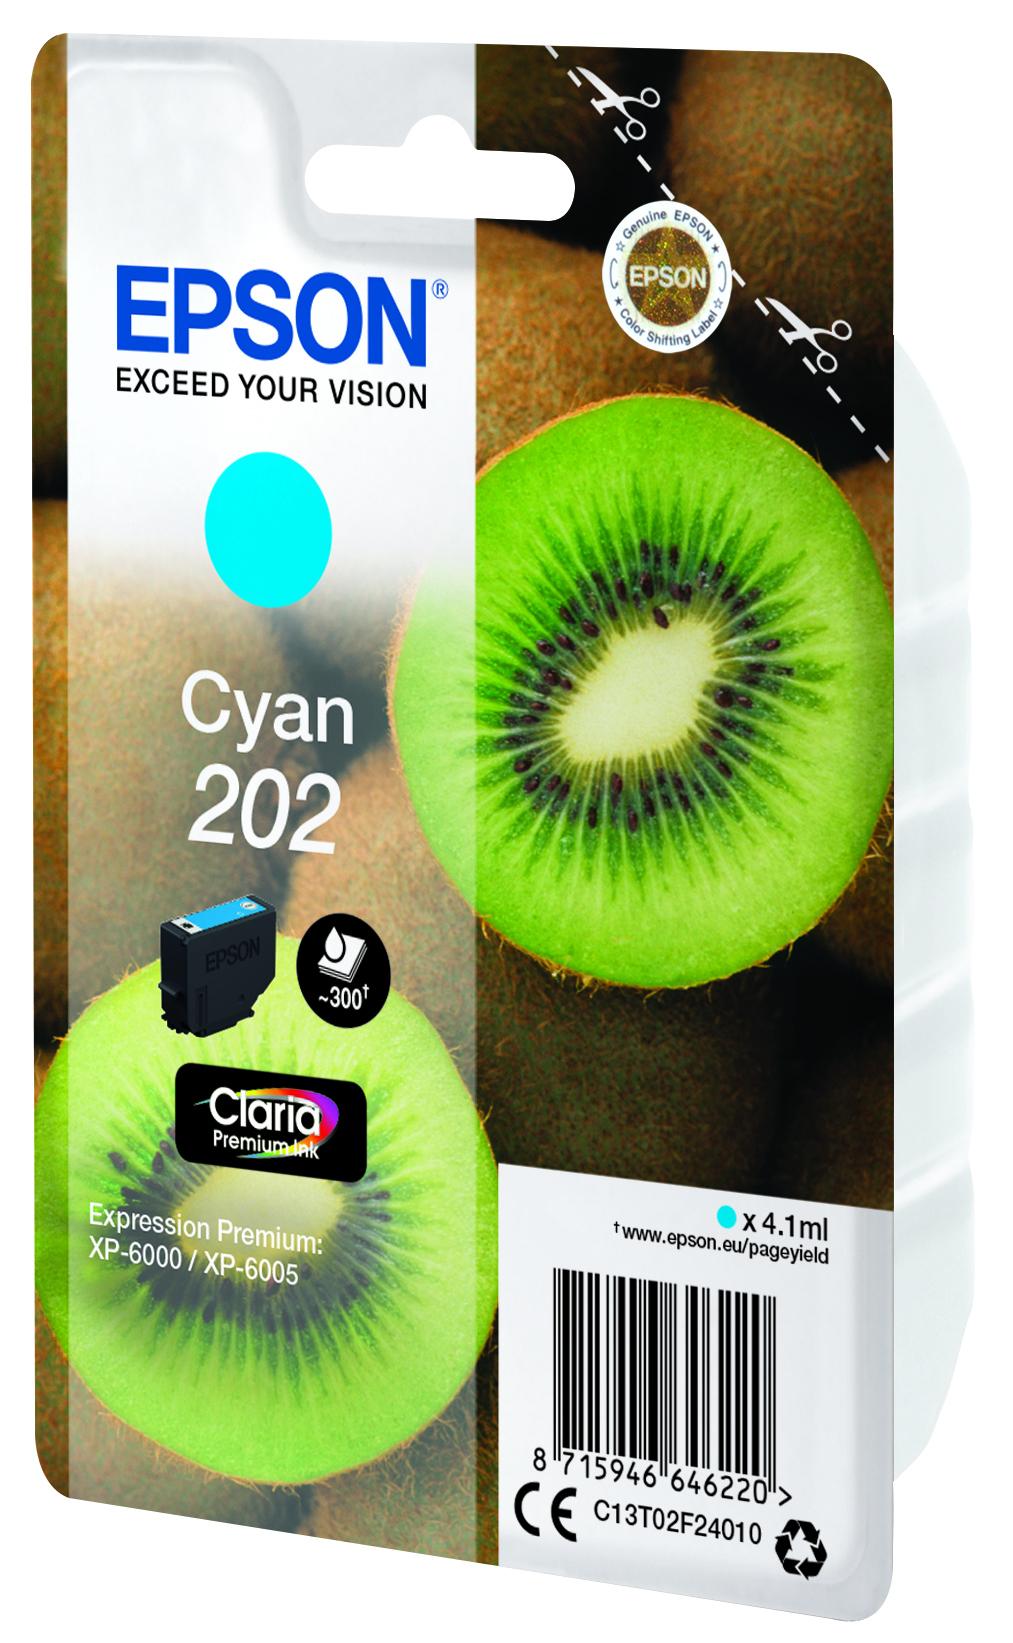 Epson-C13T02F24020-Kiwi-Singlepack-Cyan-202-Claria-Premium-Ink-Original thumbnail 4